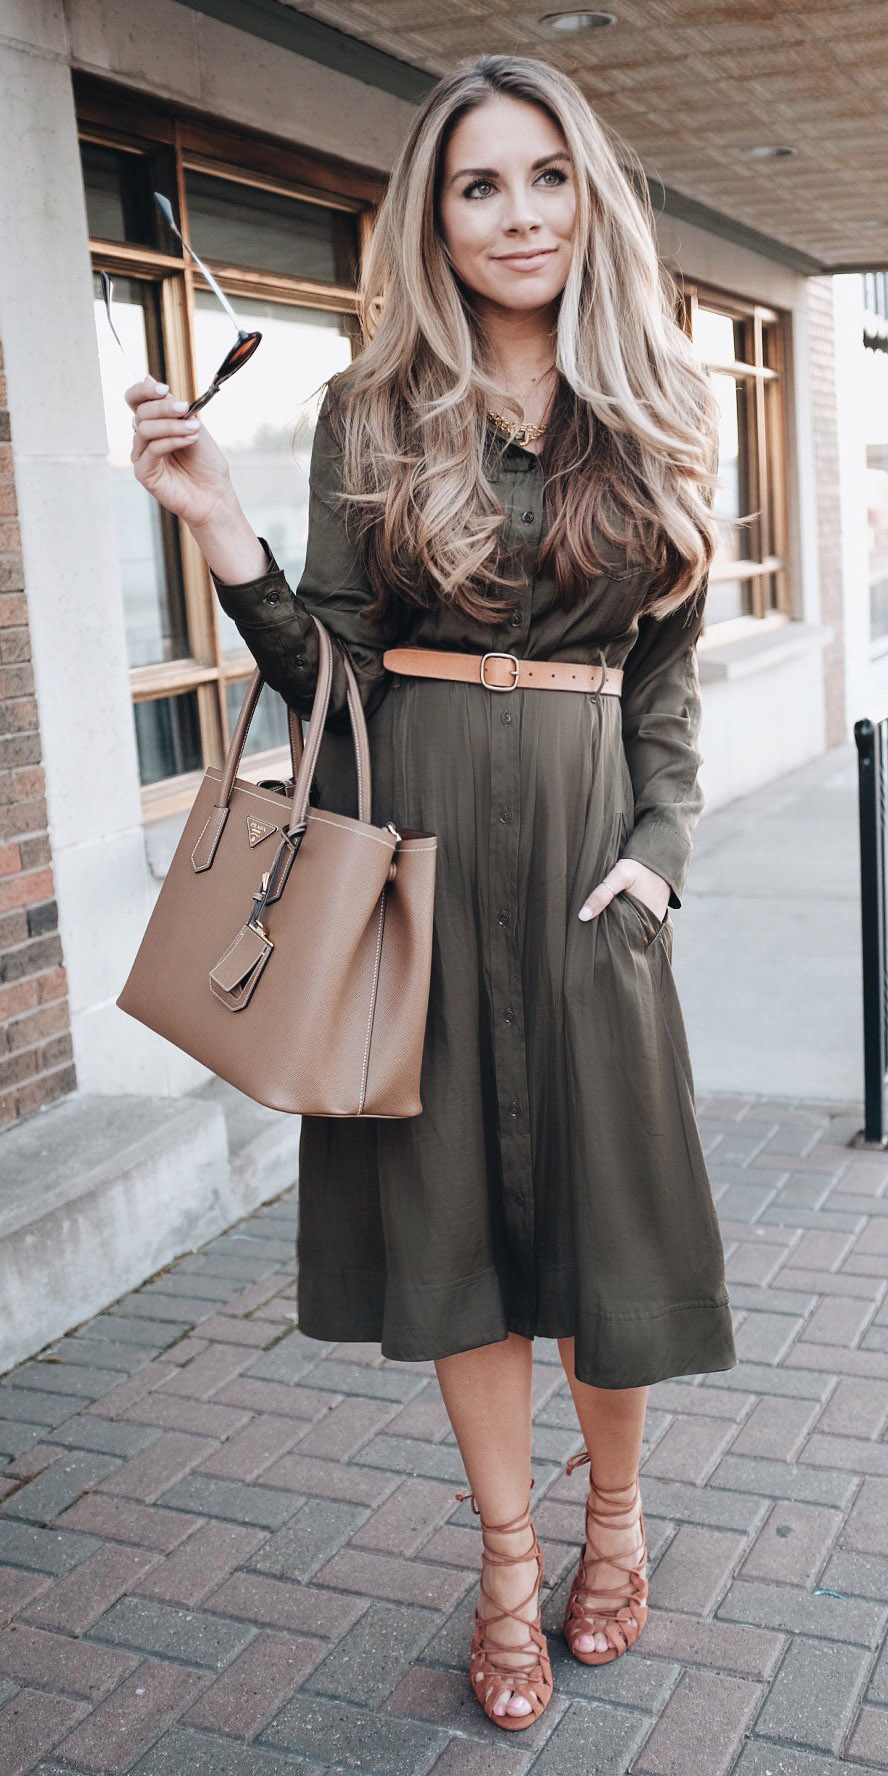 2dfbf1a9695 green-olive-dress-shirt-belt-blonde-tan-bag-